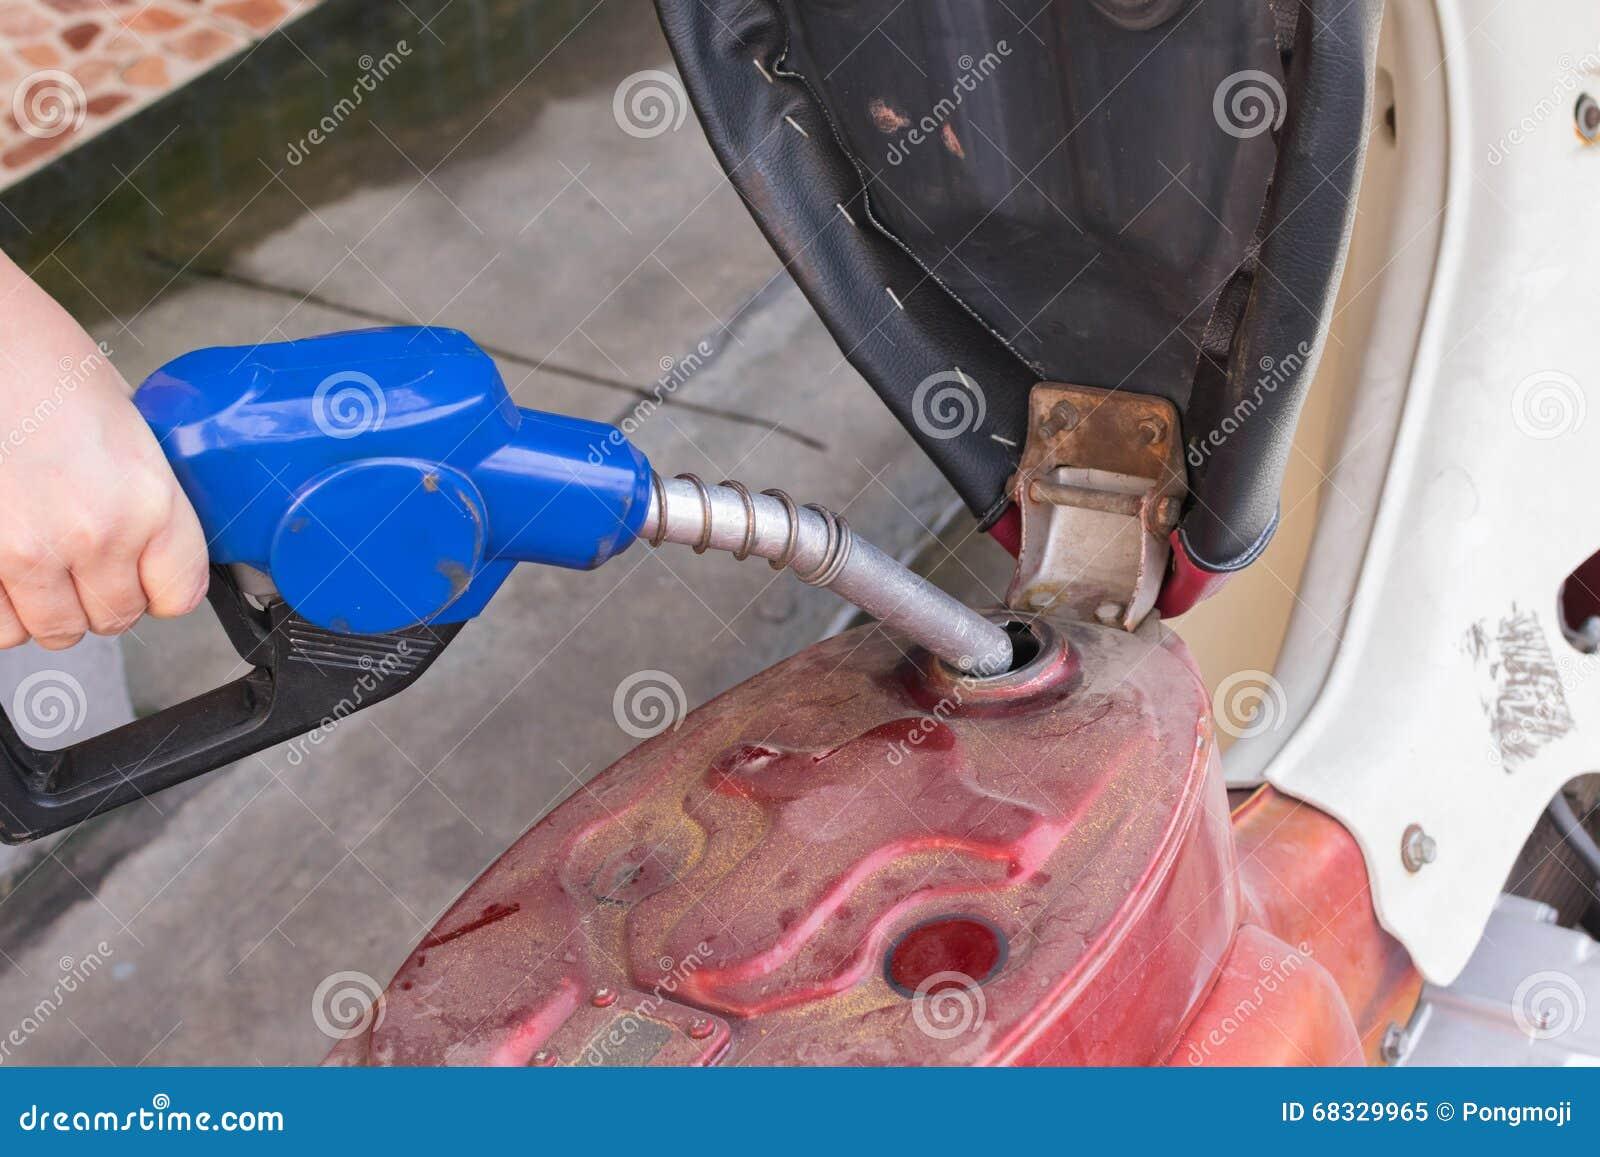 Añada el combustible a la motocicleta